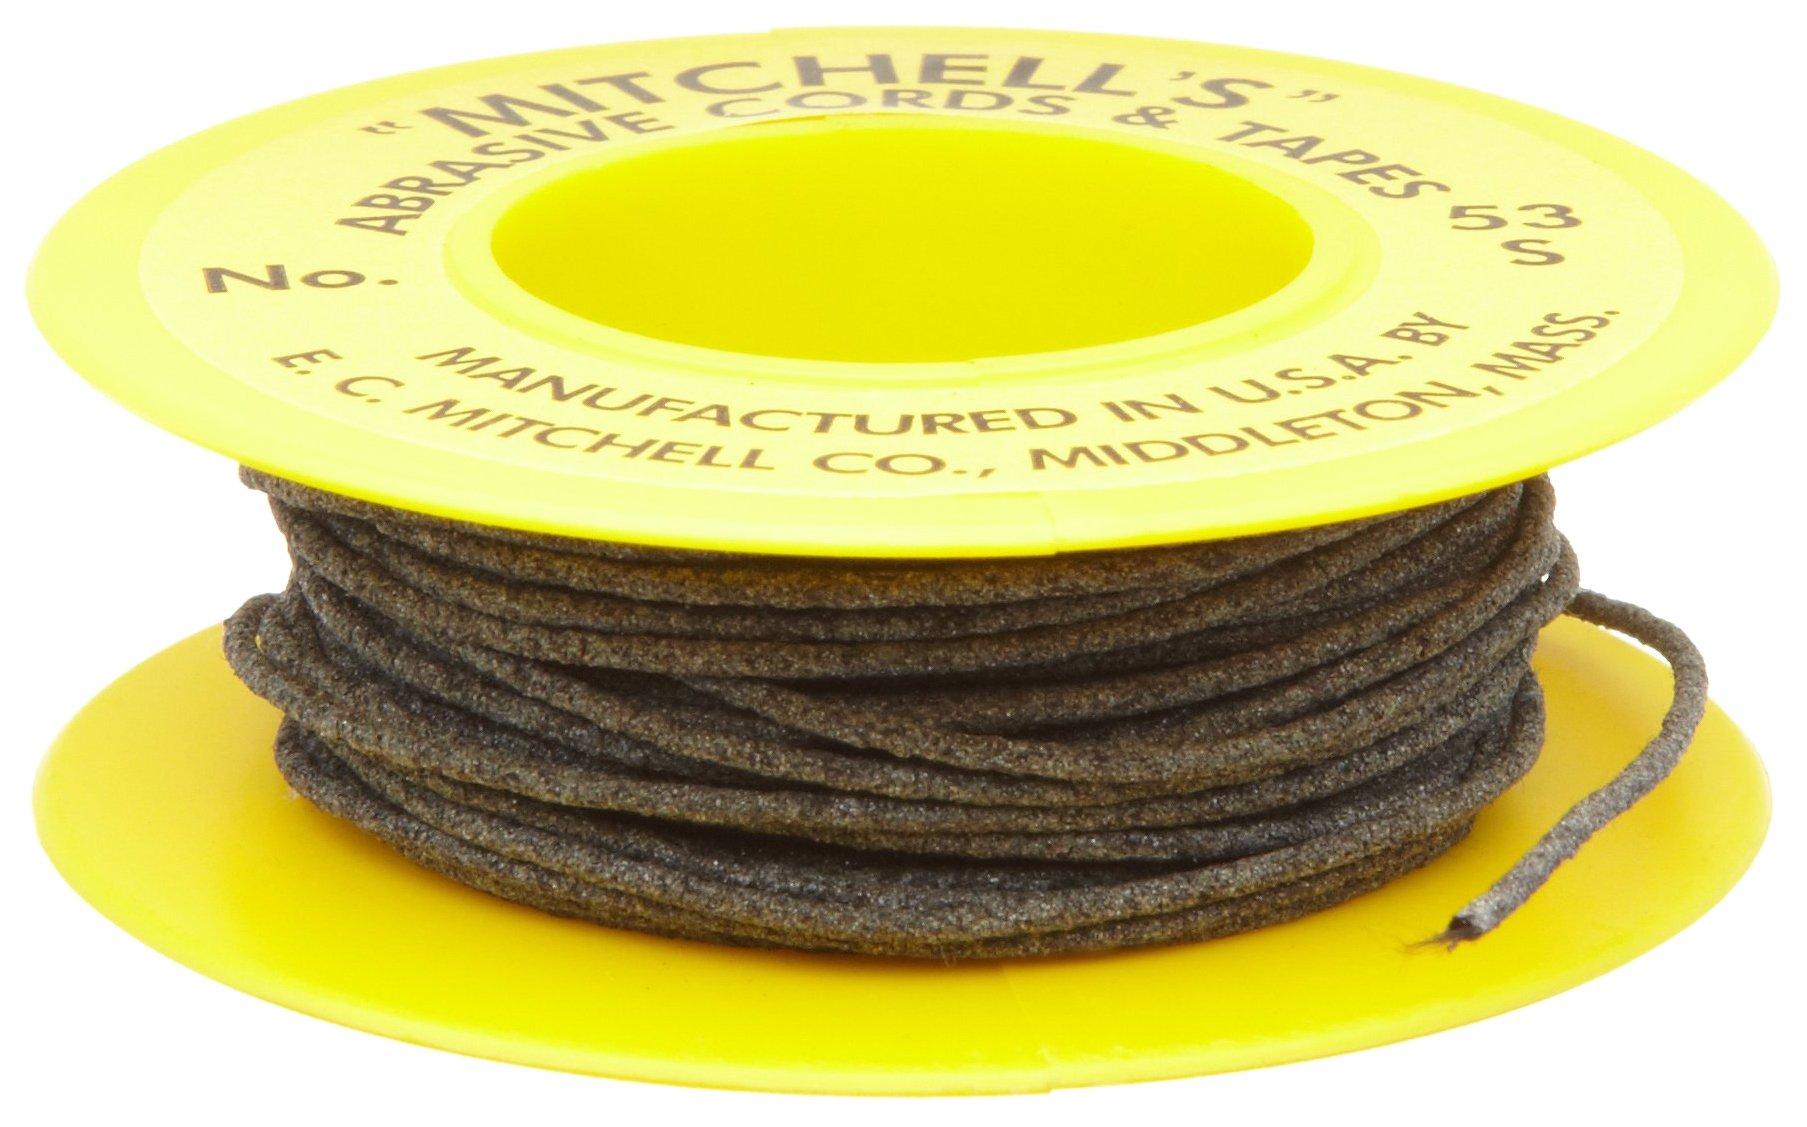 Mitchell Abrasives 53-S Round Abrasive Cord, Silicon Carbide 180 Grit .040'' Diameter x 25 Feet by Mitchell Abrasives